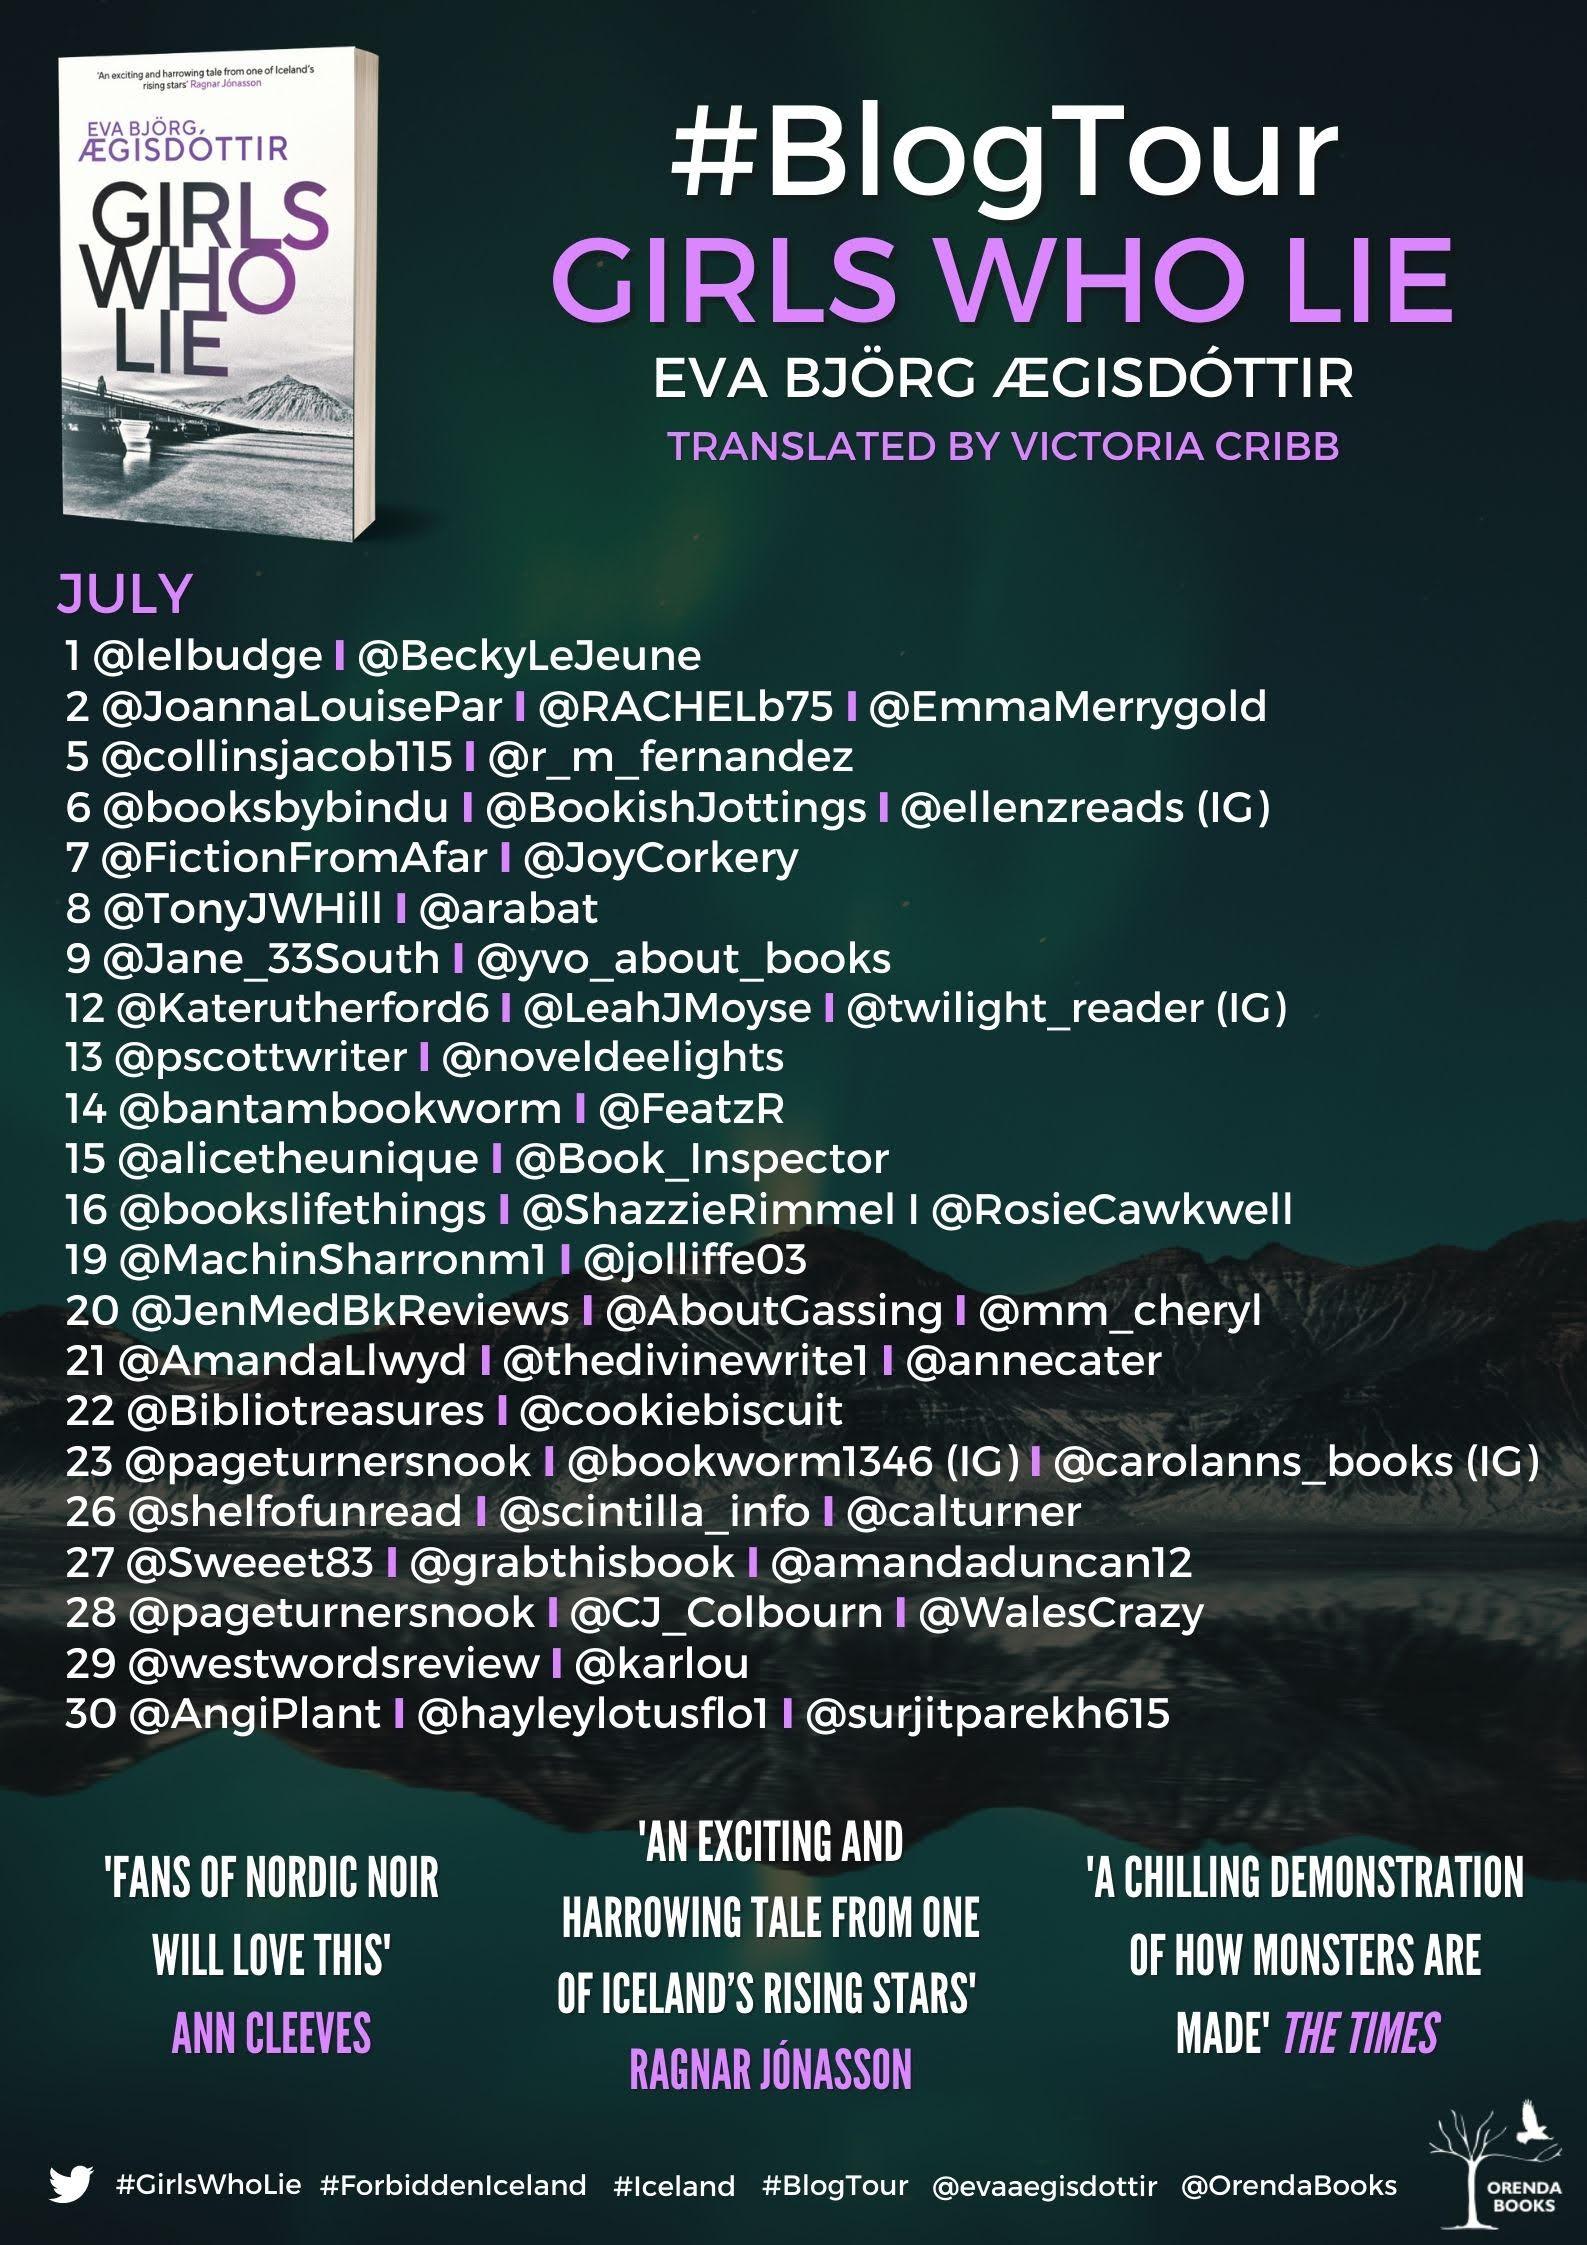 The Girls Who Lie Blog Tour